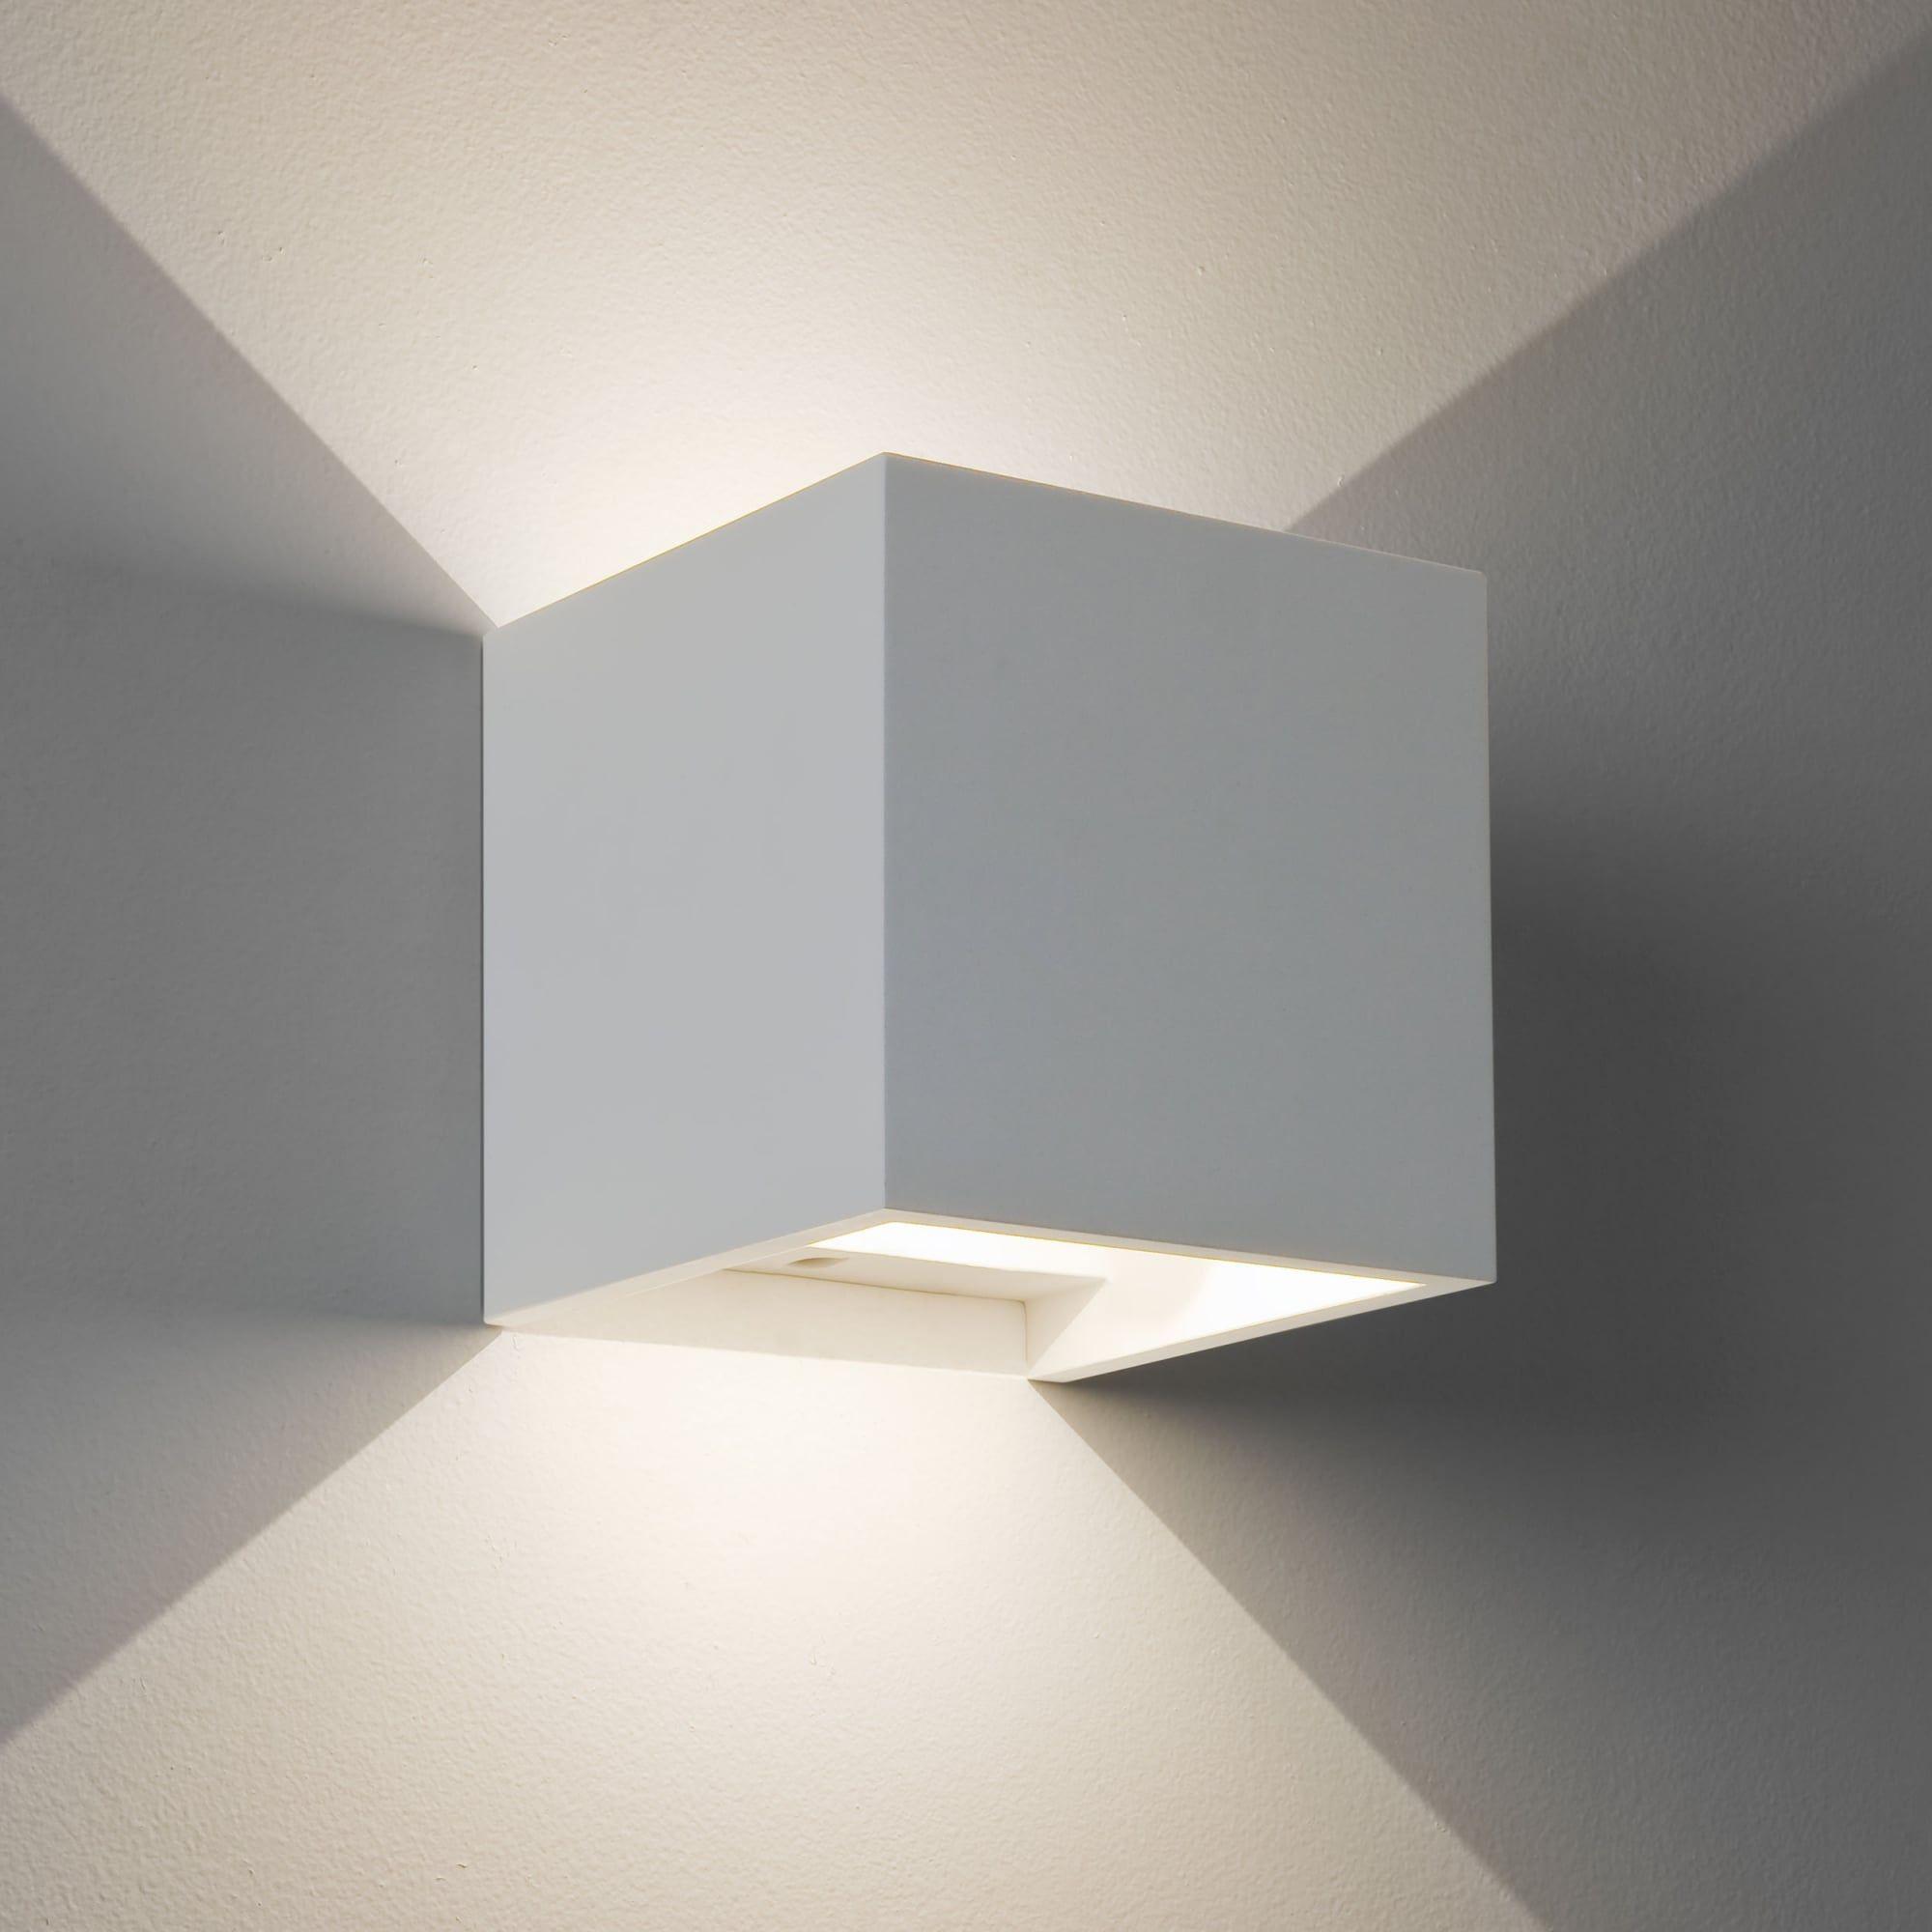 Astro Lights Pienza Led 2700k White Plaster Wall Light In 2020 Interior Wall Lights Wall Lights Plaster Wall Lights